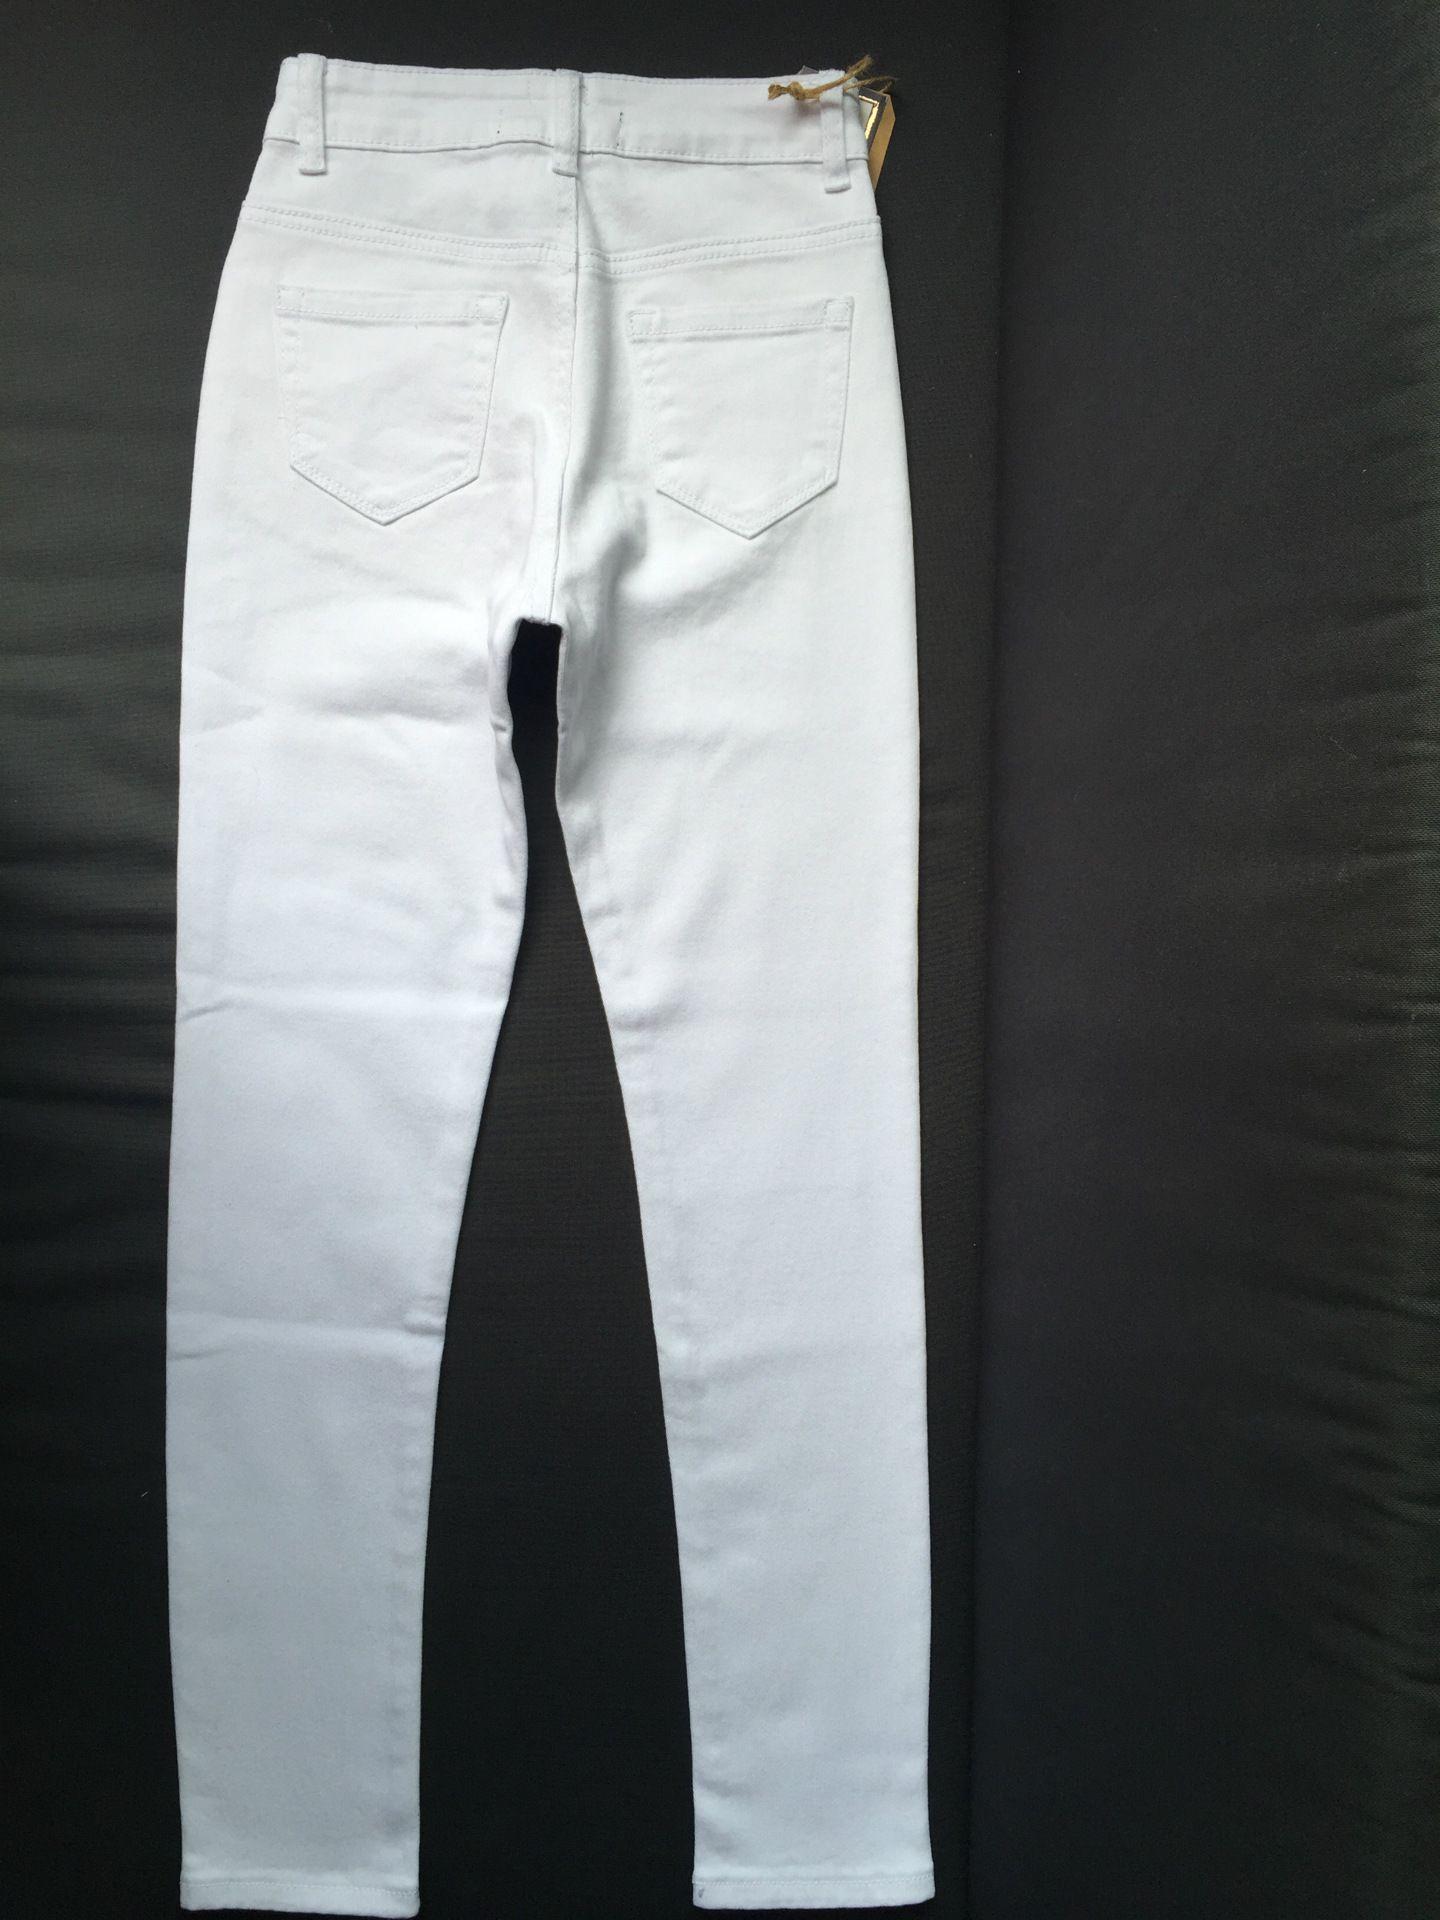 2017042301 jeans a vita alta moda donna Femme Pantaloni matita stretch bianchi denim con tasche jeans strappati skinny le donne 2017